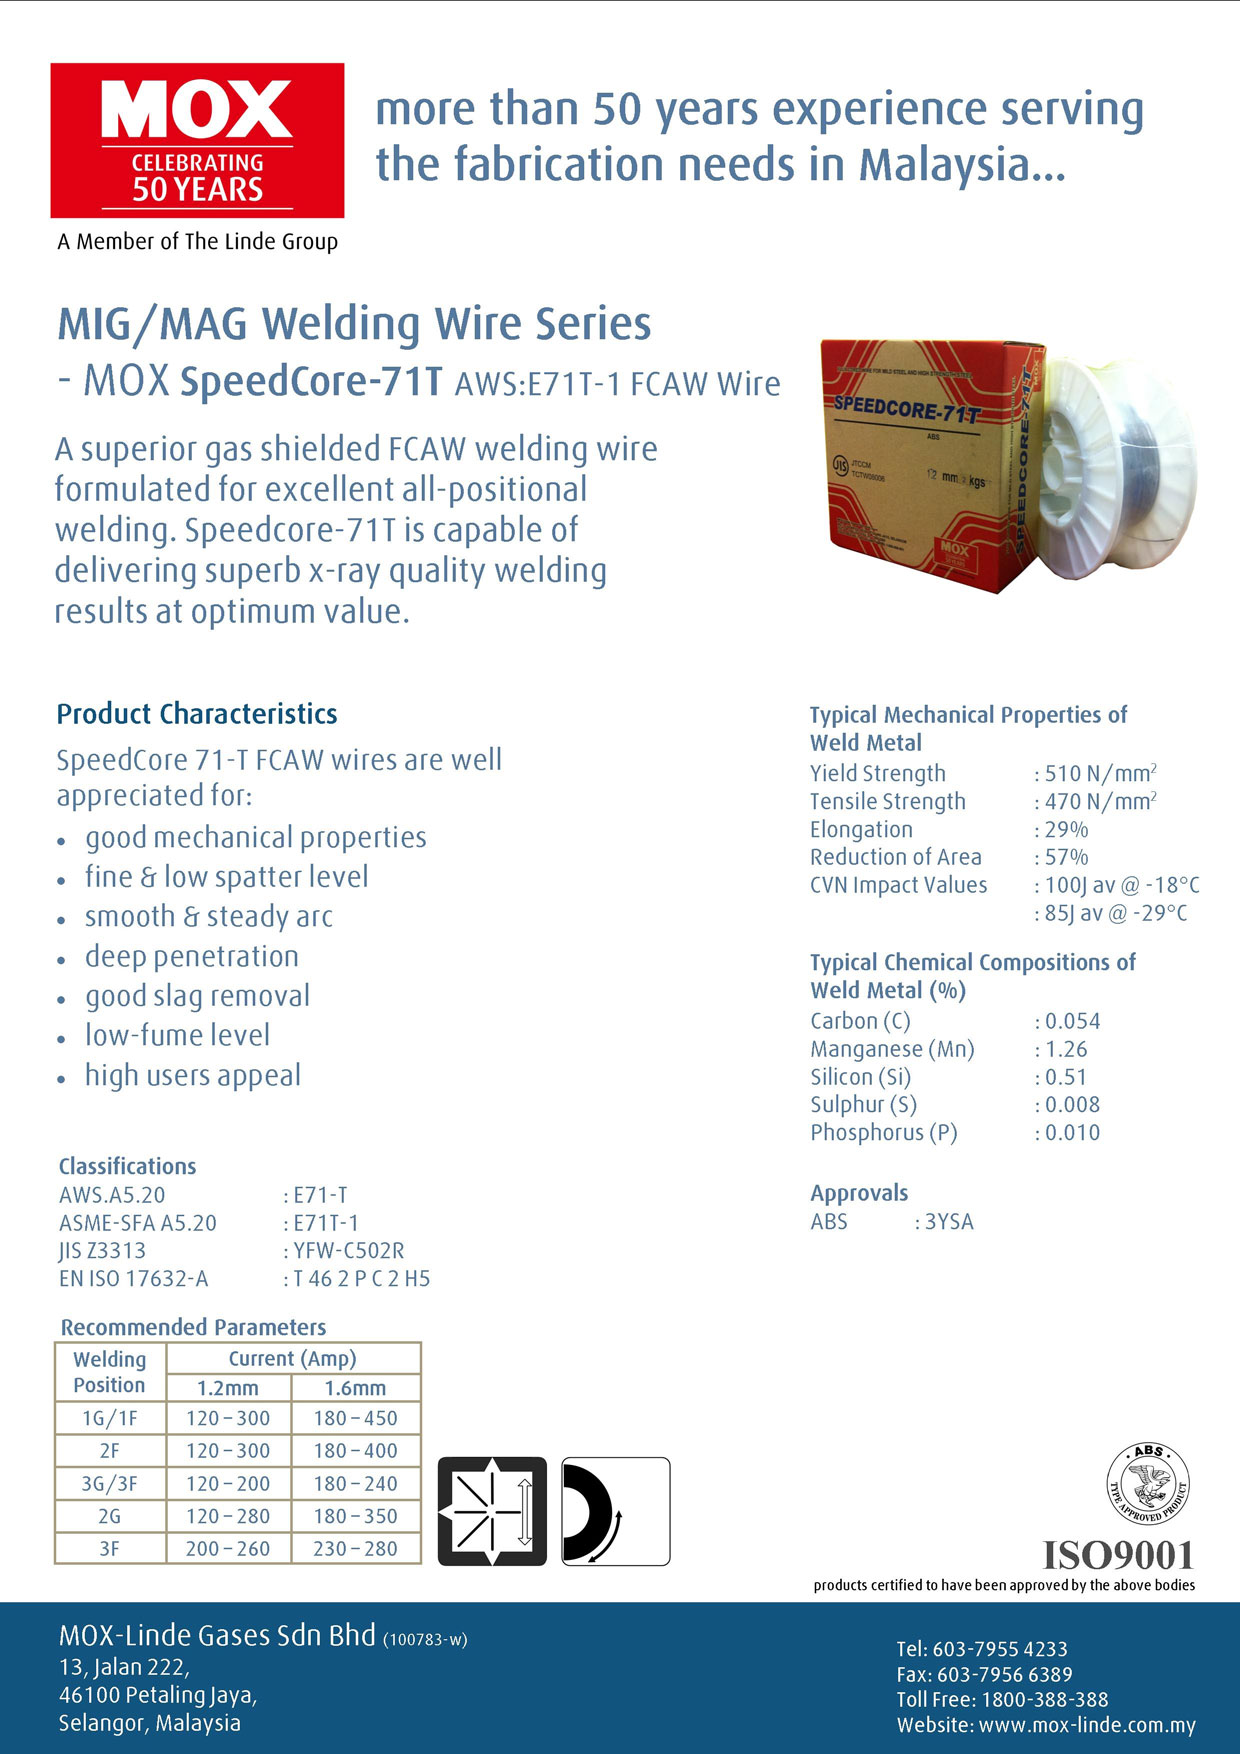 Malaysia MOX Welding Wire, Matador Welding Wire & Welding Consumable ...